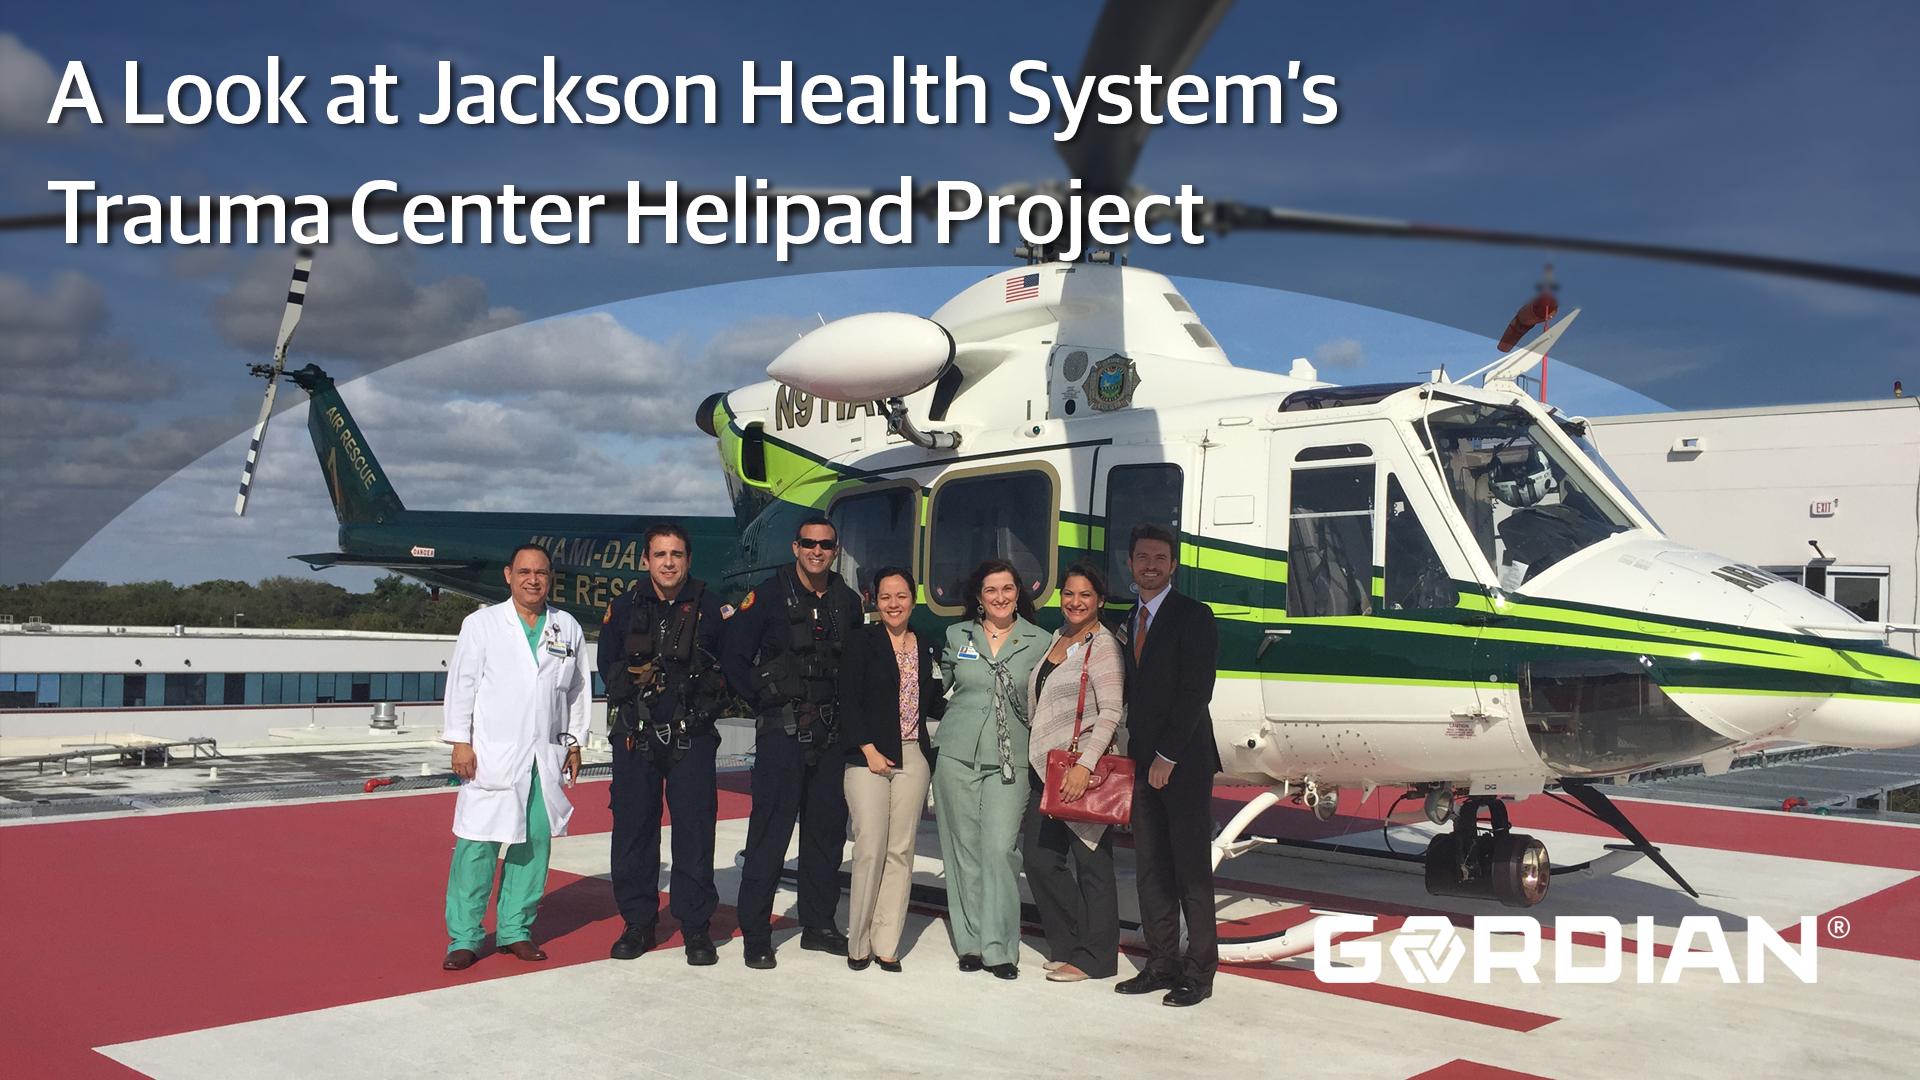 Healthcare System Builds Helipad Using JOC